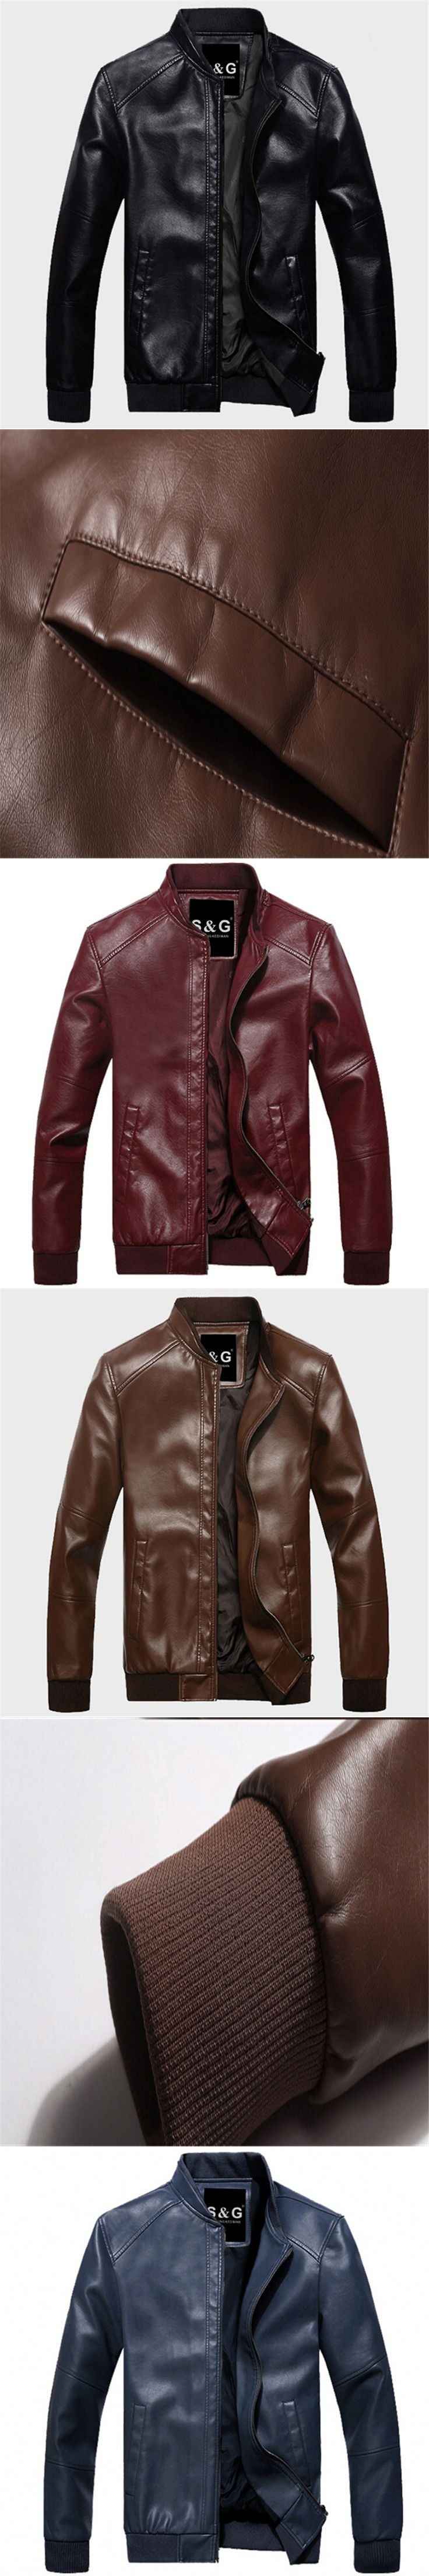 In the autumn of 2017 senior men PU leather thin leather jacket youth casual jacket slim Korean baseball uniform code